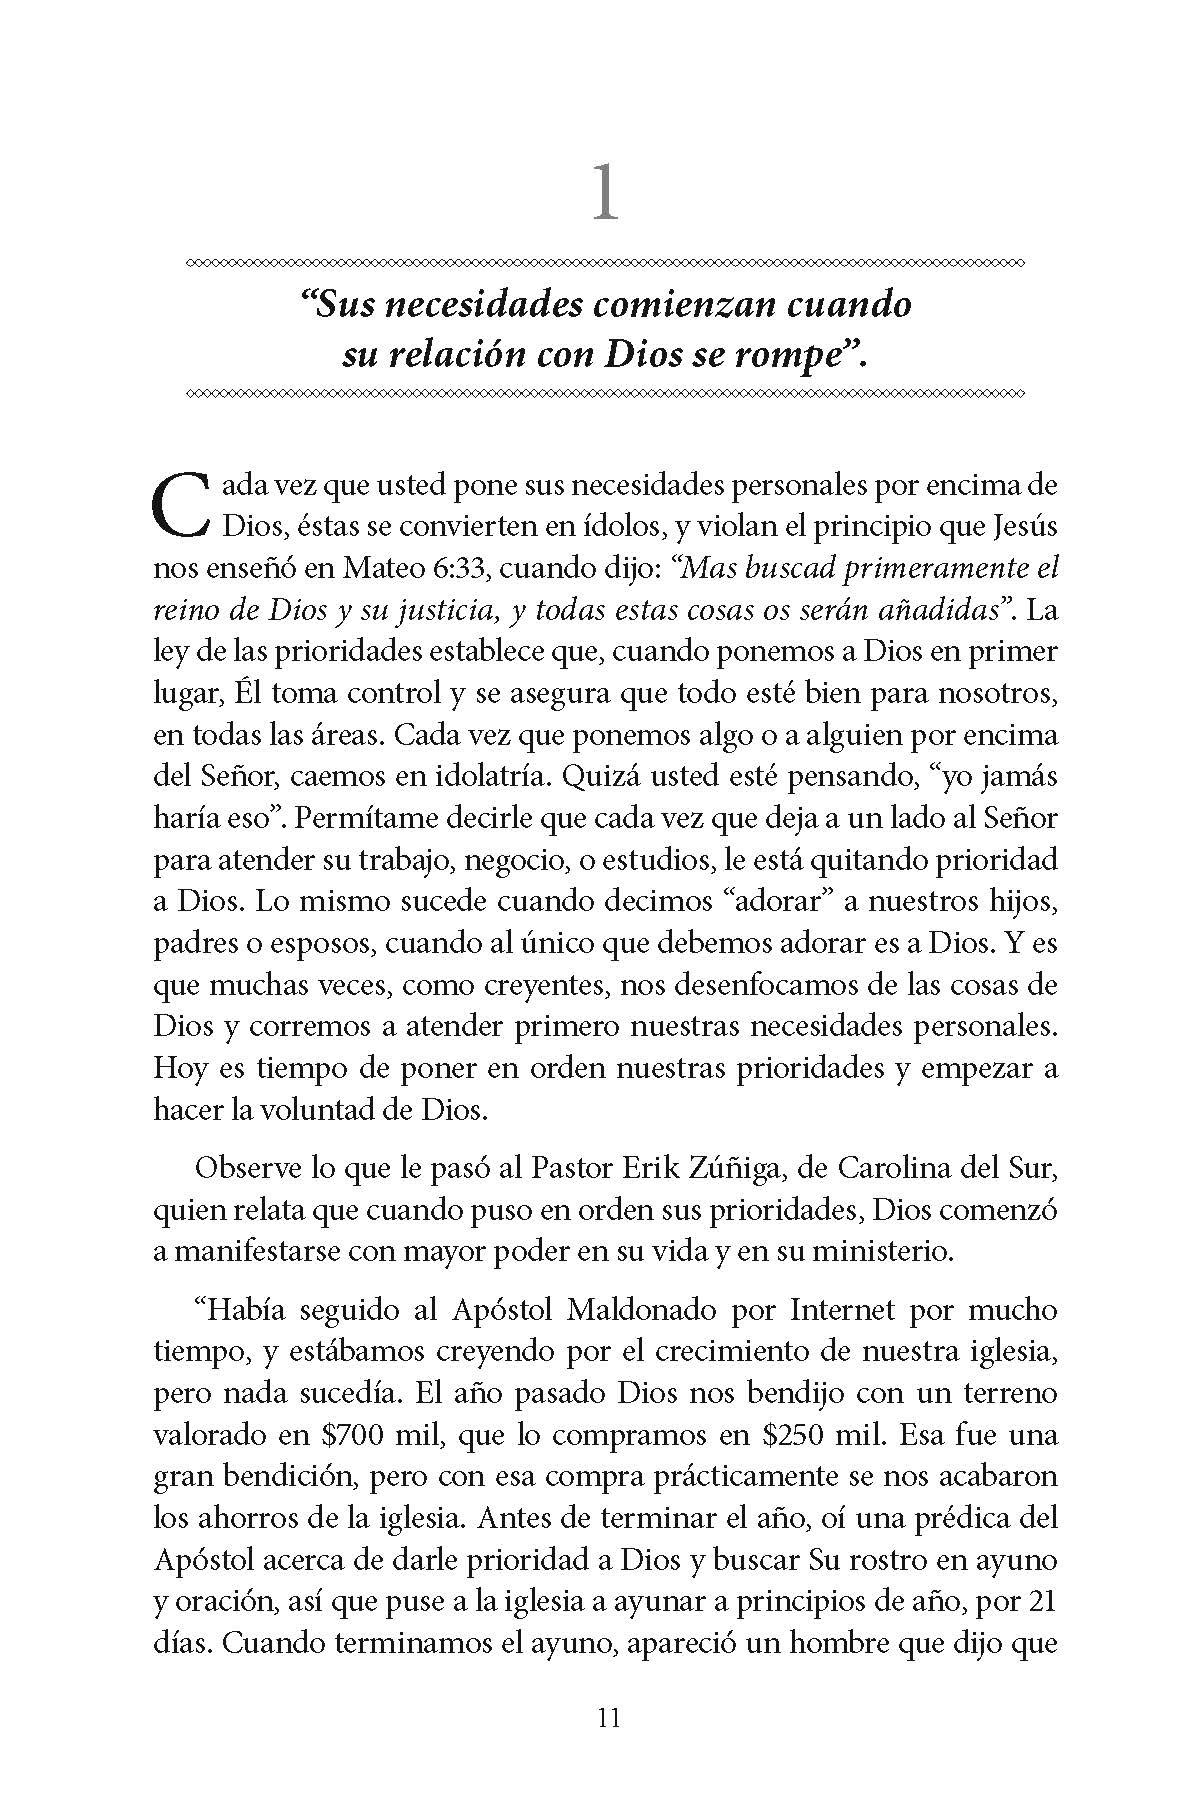 Encuentros Diarios con Dios: Un Devocional Sobrenatural (Spanish Edition): Guillermo Maldonado: 9781592726028: Amazon.com: Books